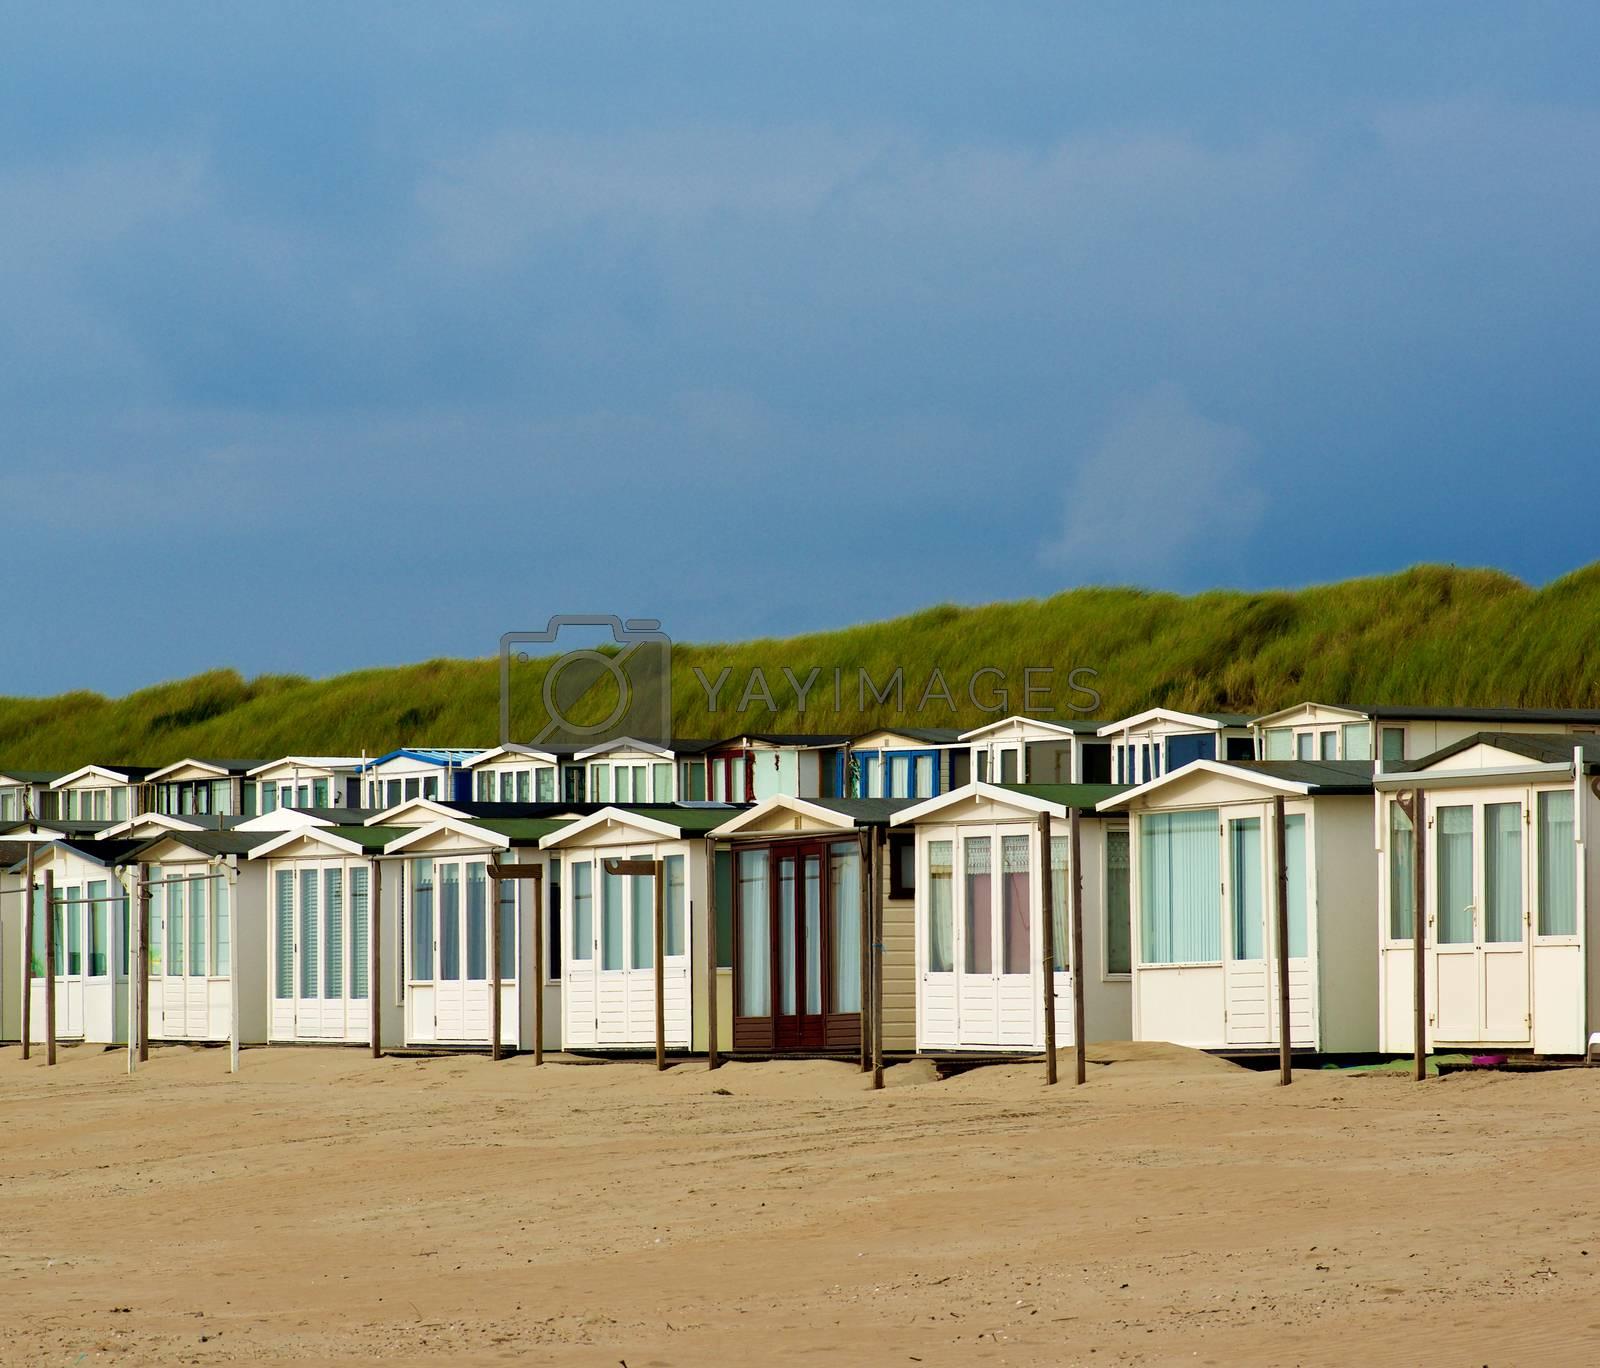 Beach Houses in Dunes by zhekos